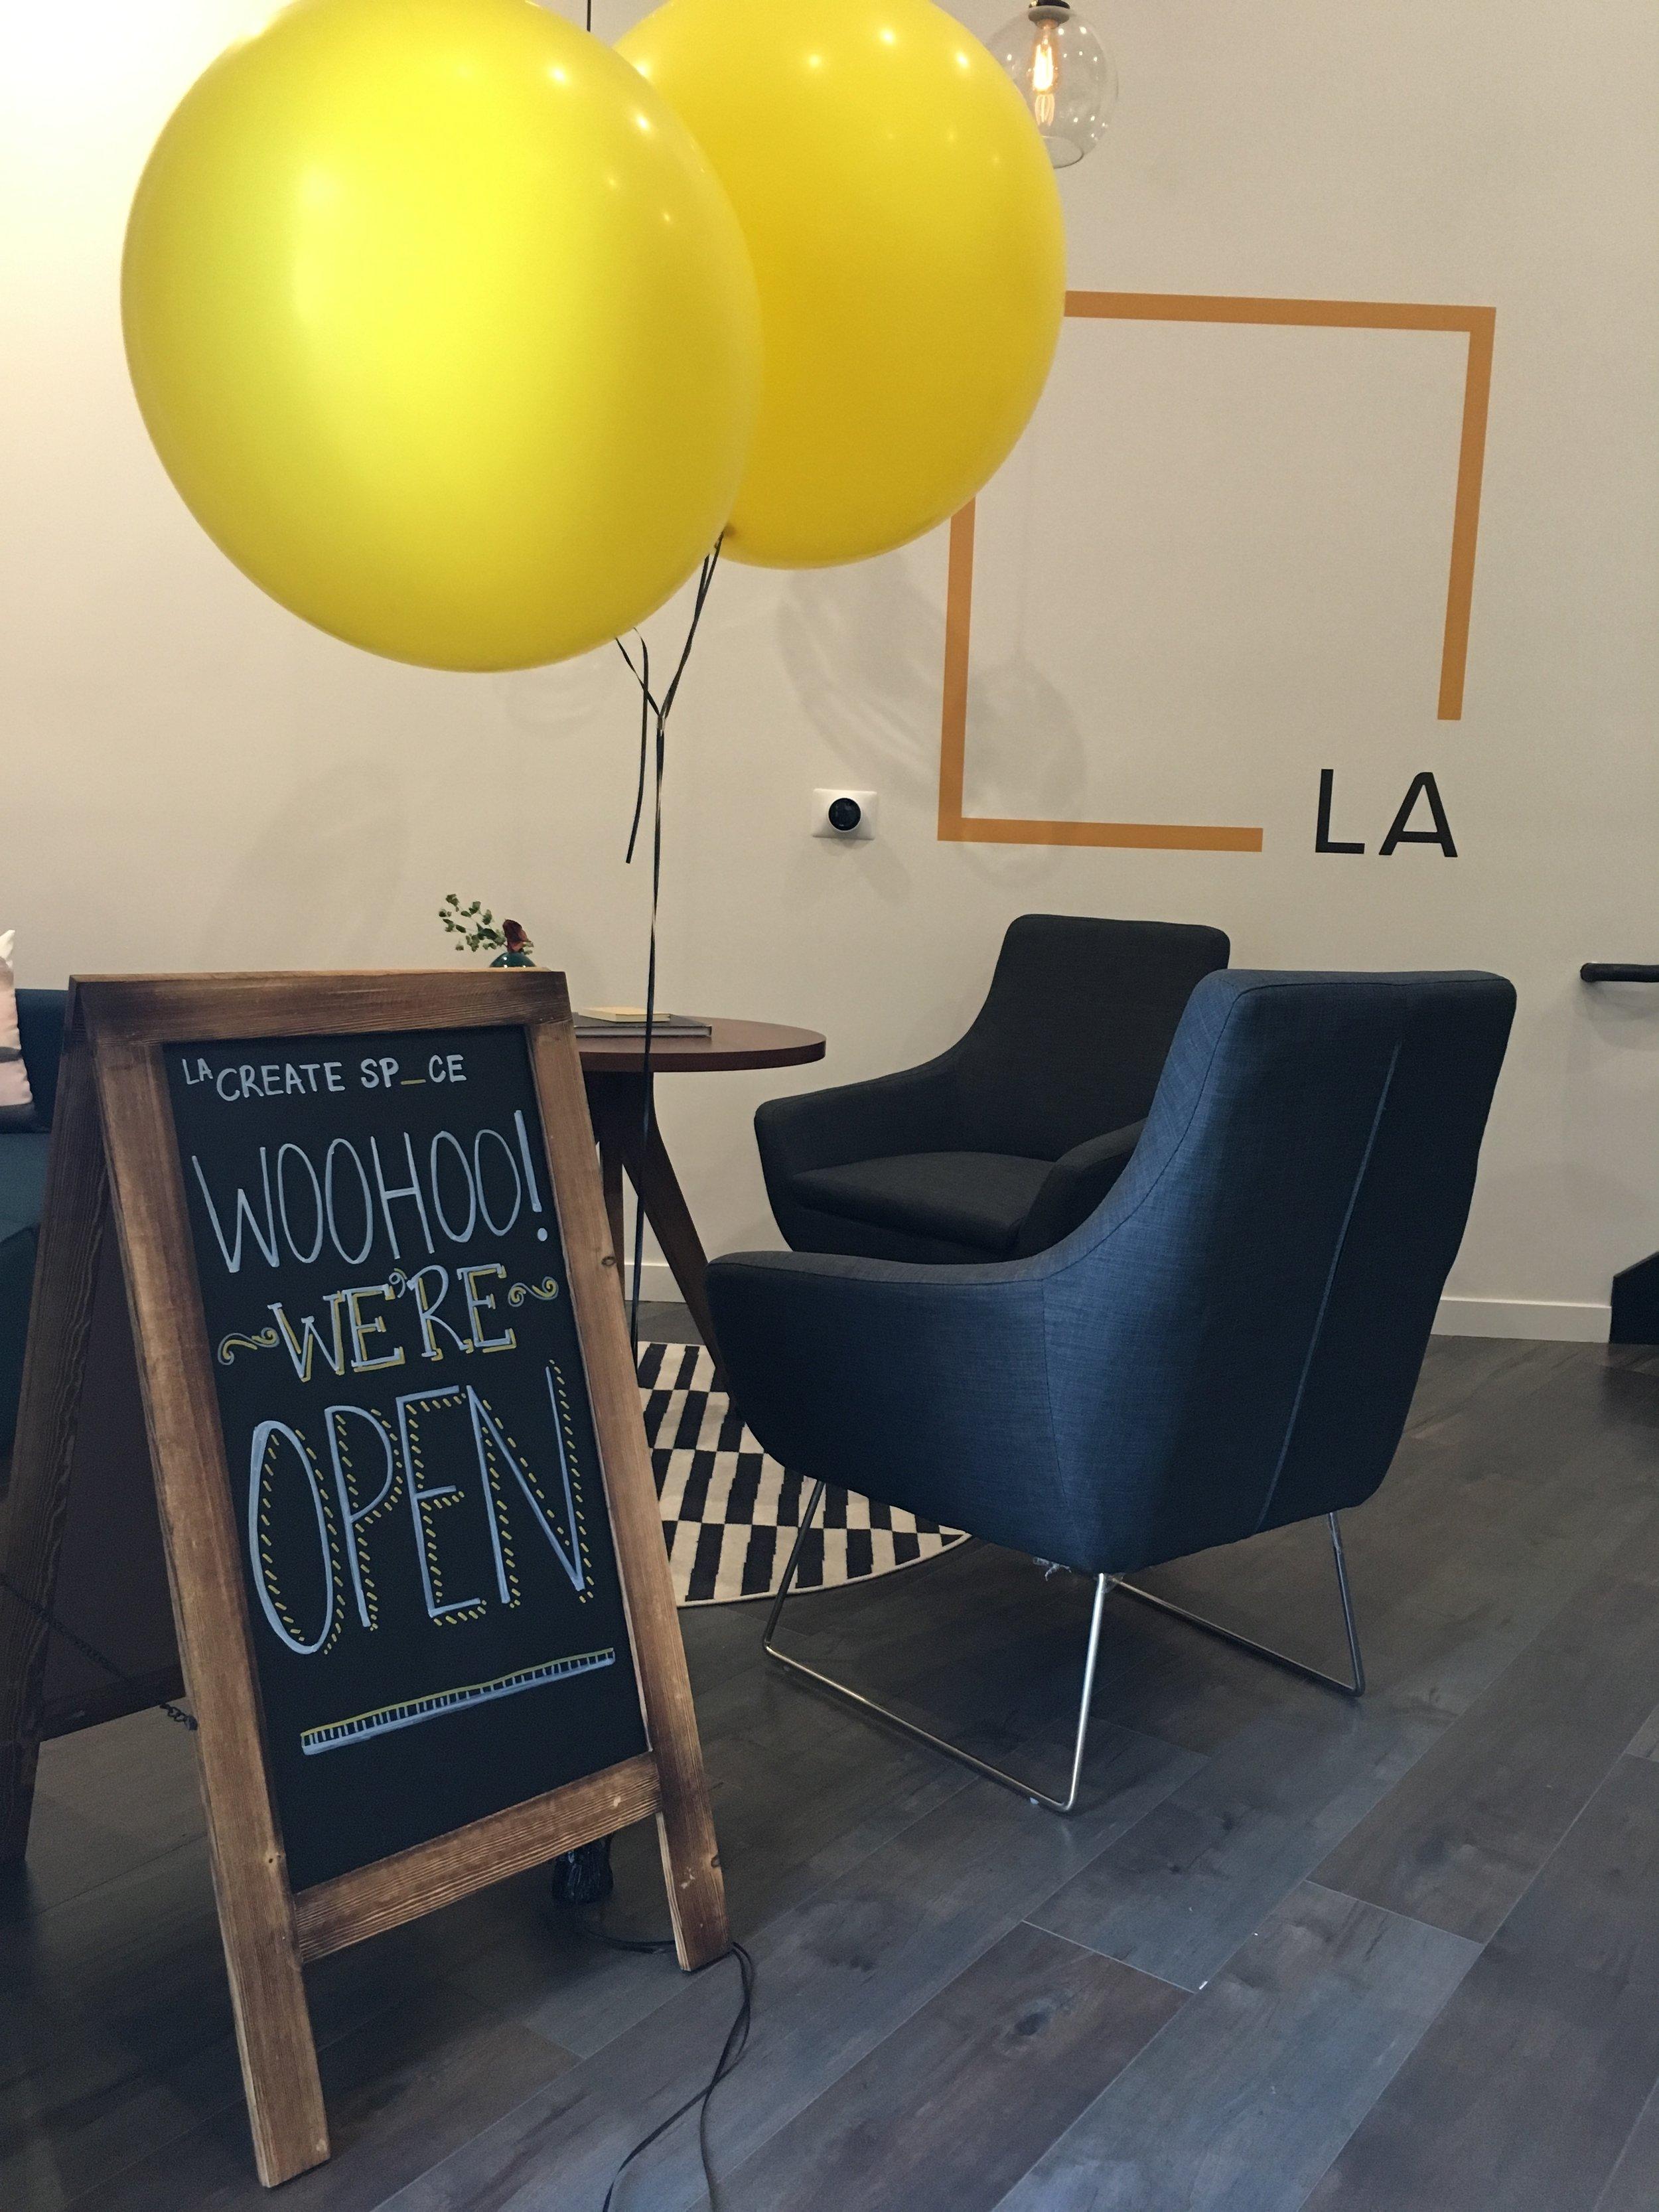 LA Create Space Grand Opening